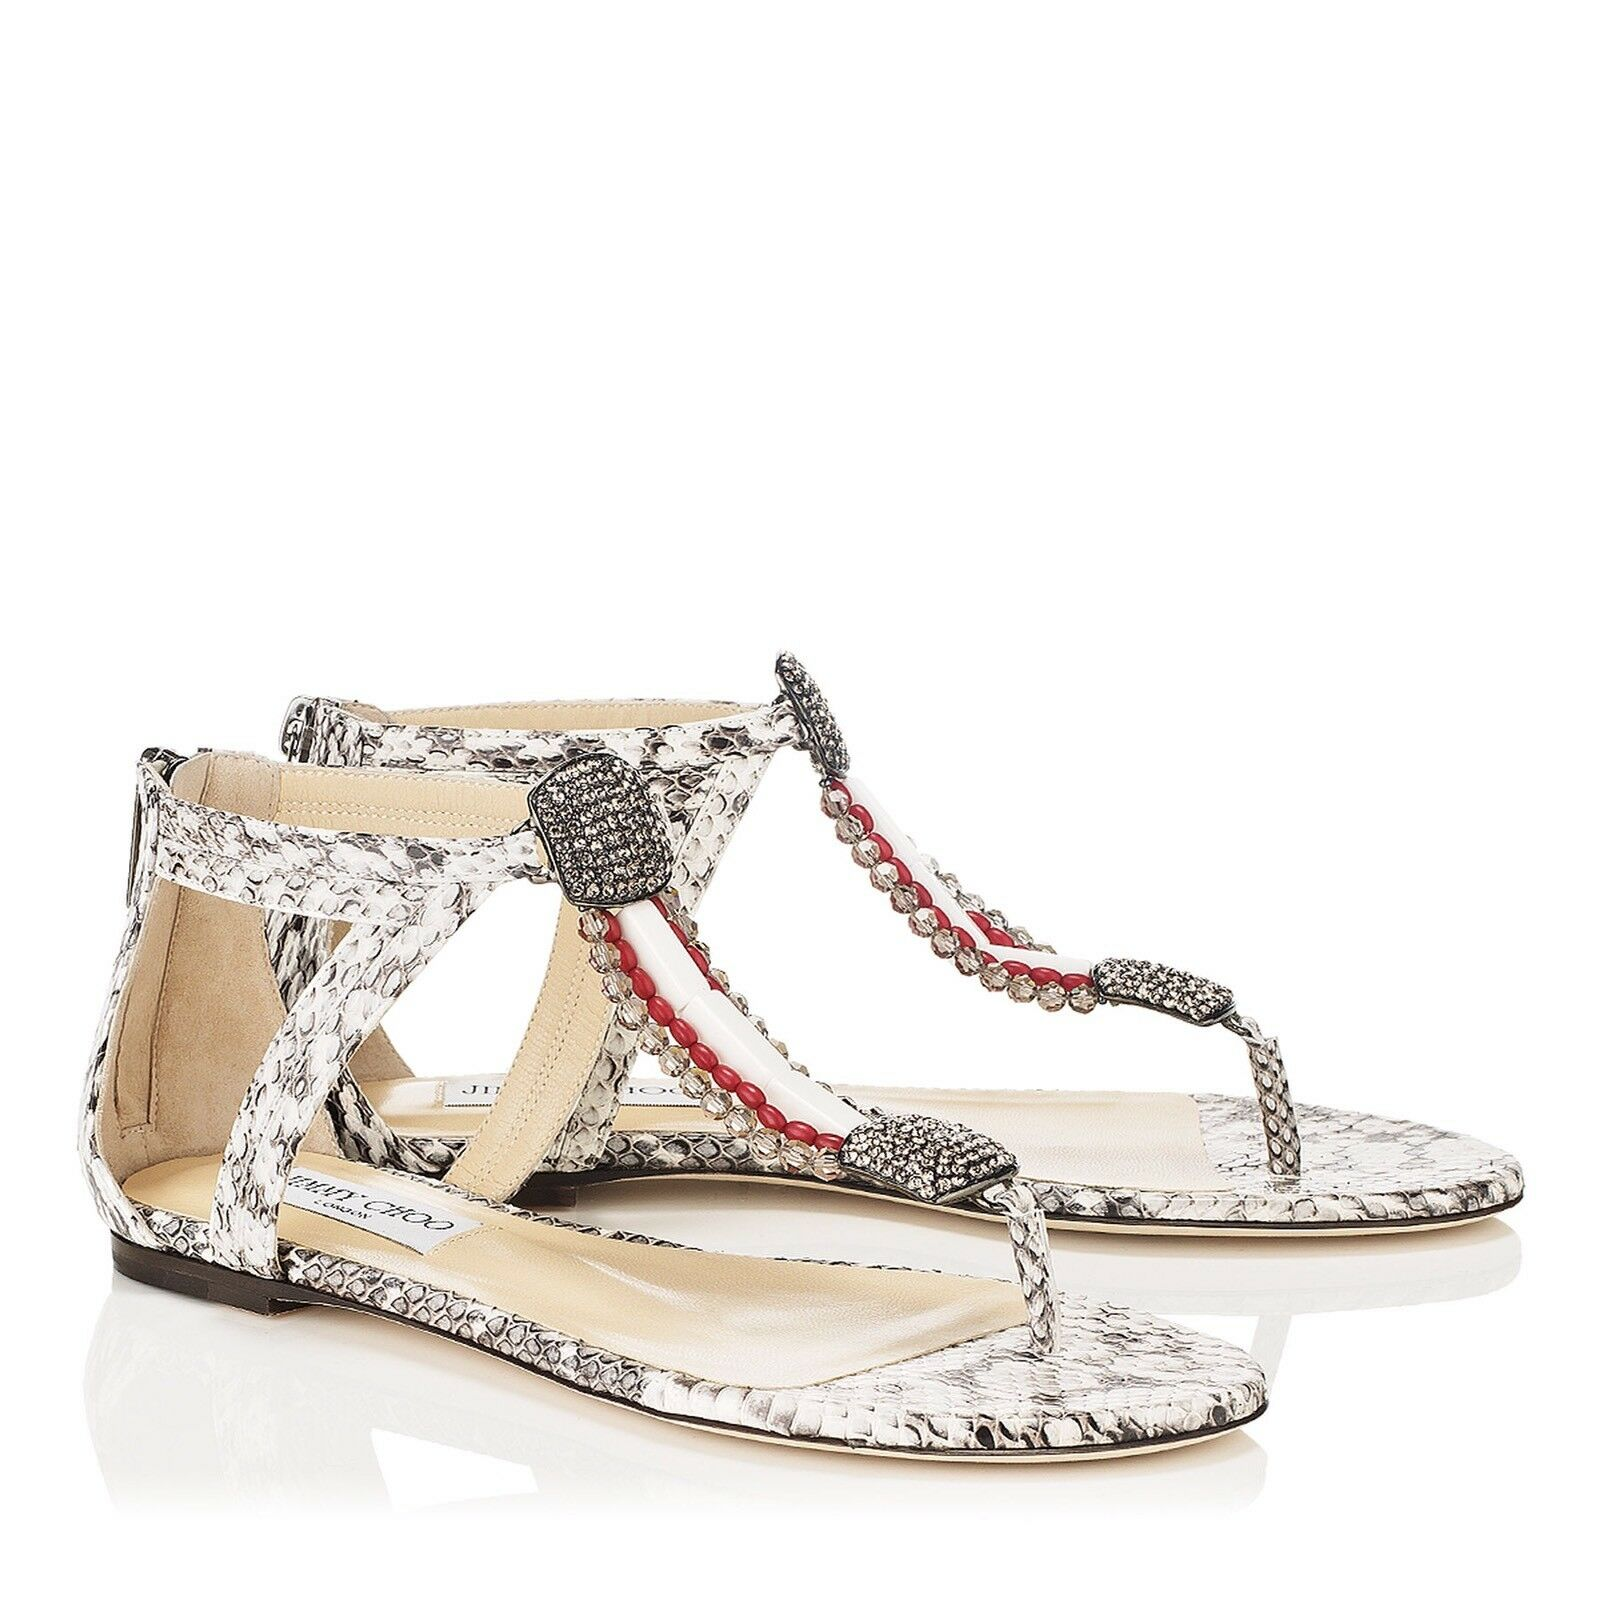 $595 Chloe Laurent Scalloped Ankle Strap Ballerina Ballet 6 Flat Shoes Nero 36 6 Ballet 5cbfdc